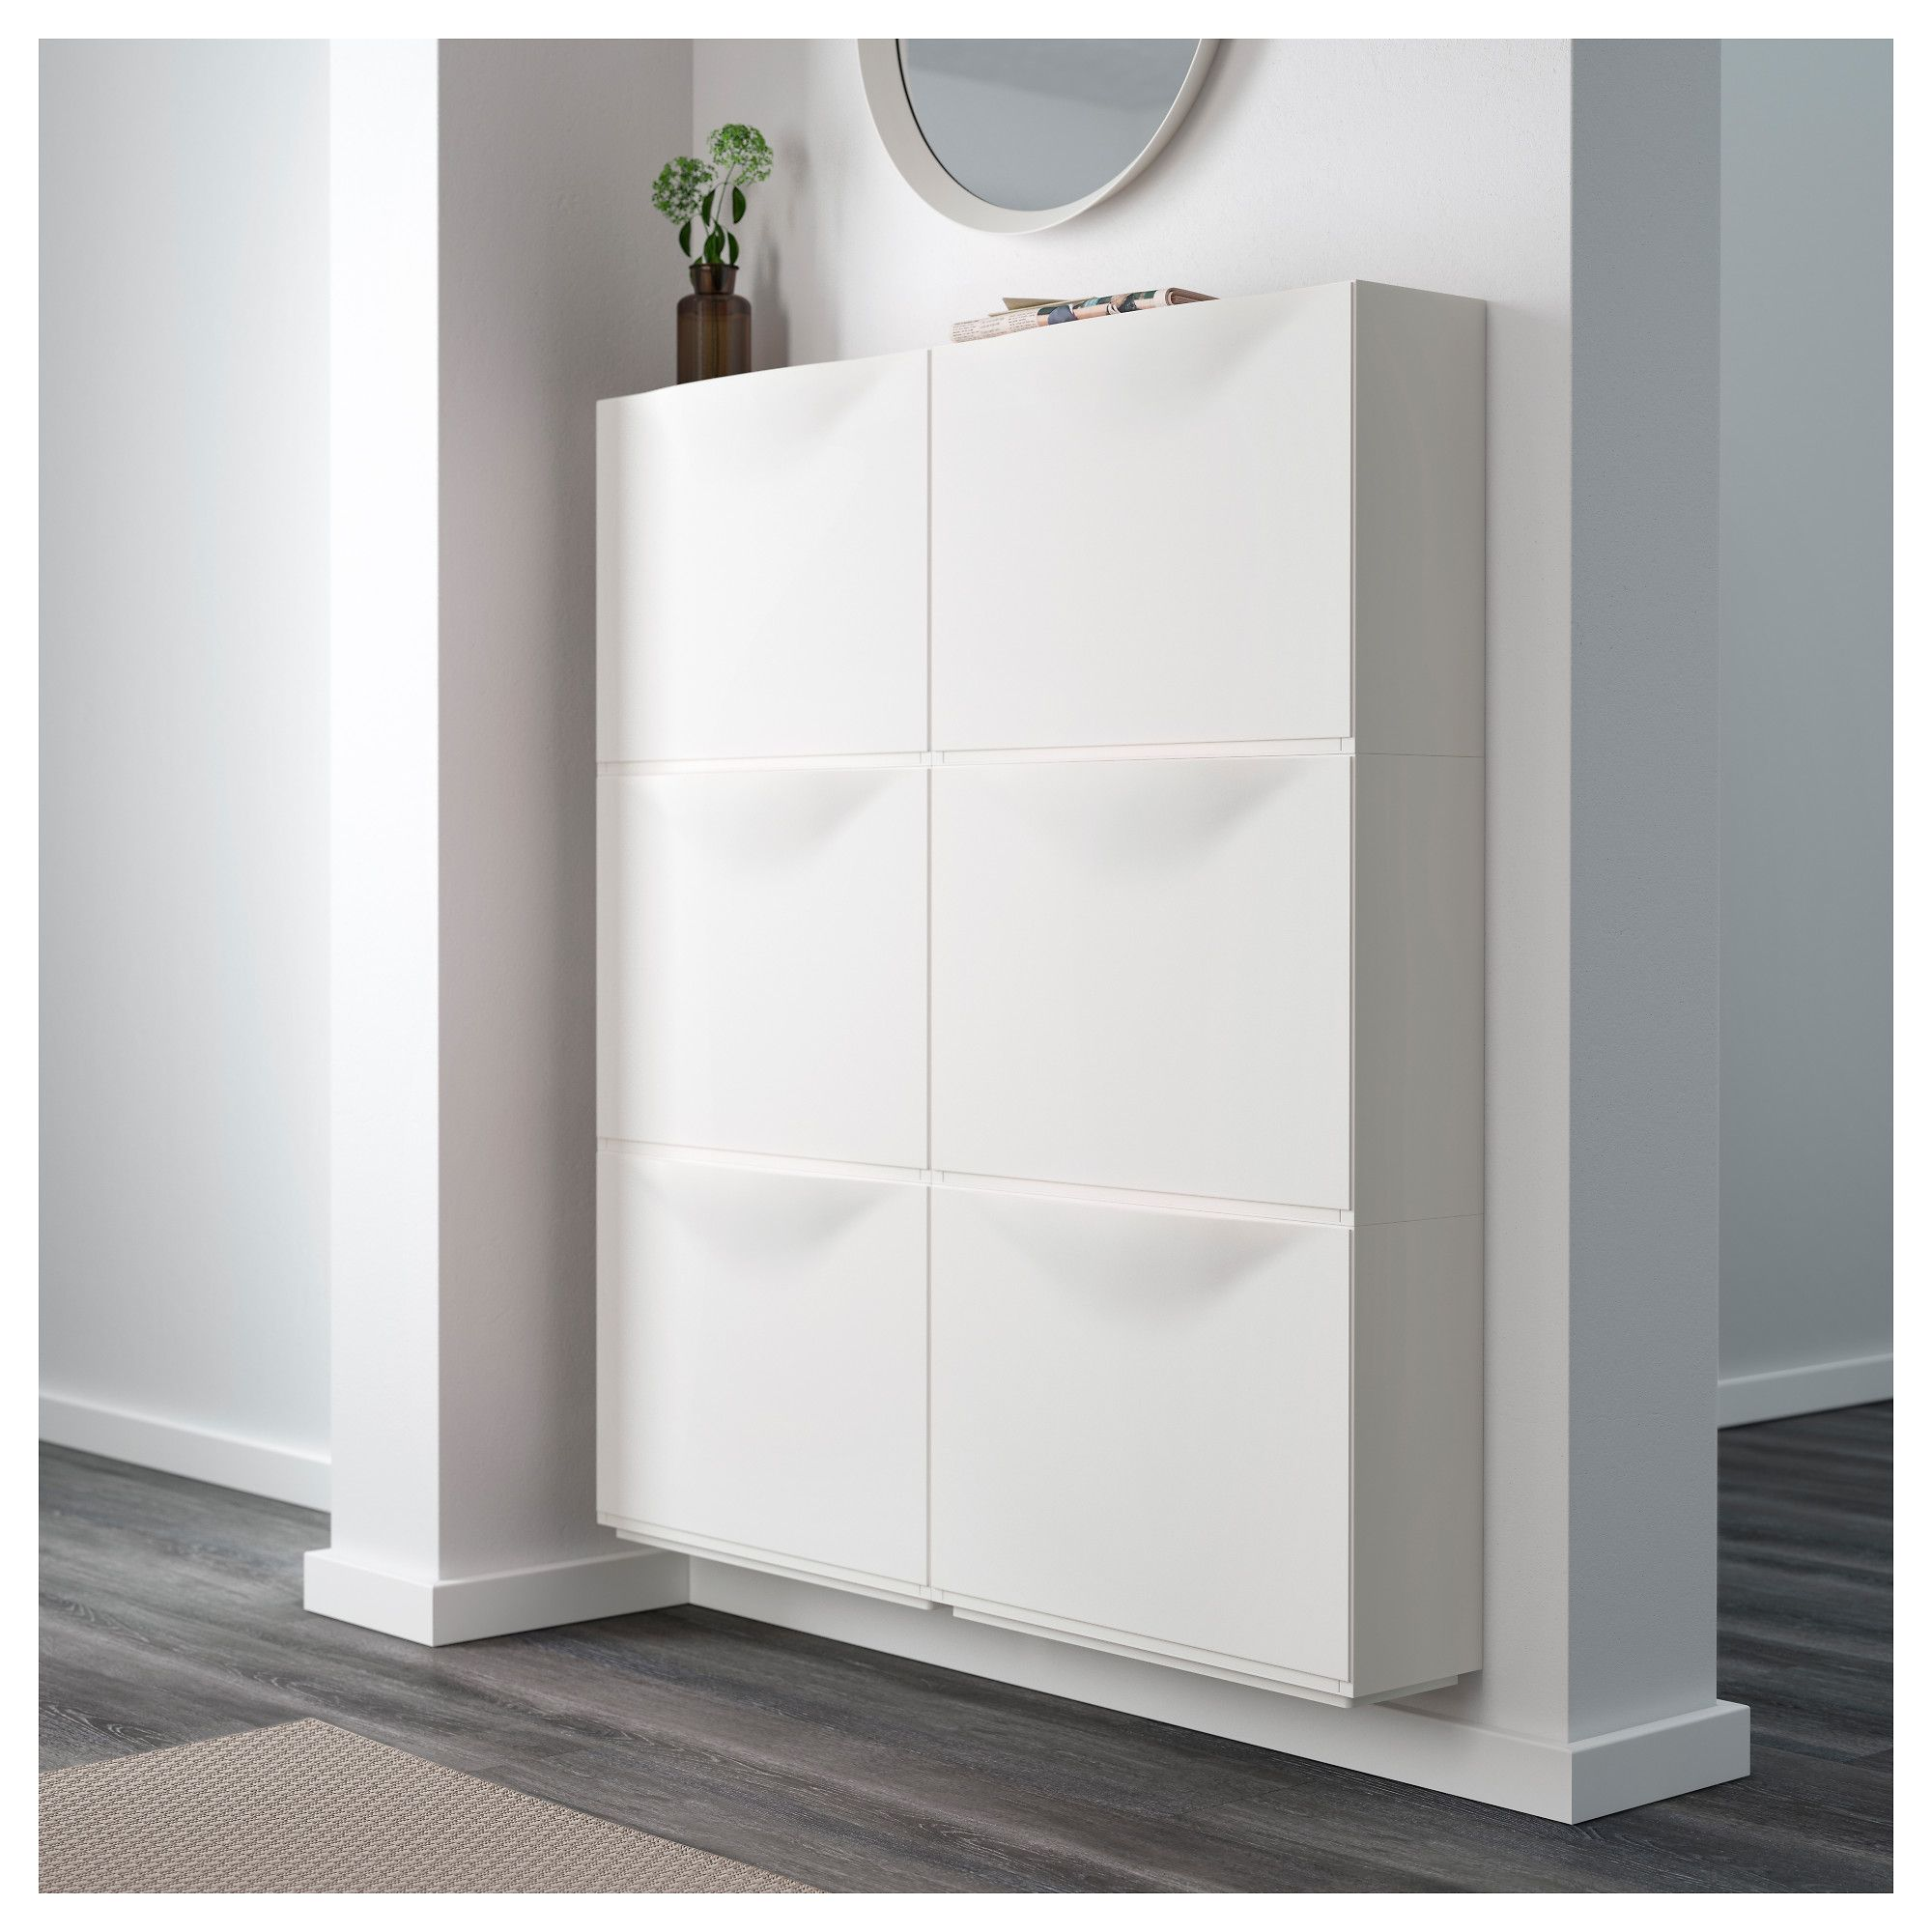 Trones Shoe Cabinetstorage White 51X39 Cm  Ikea